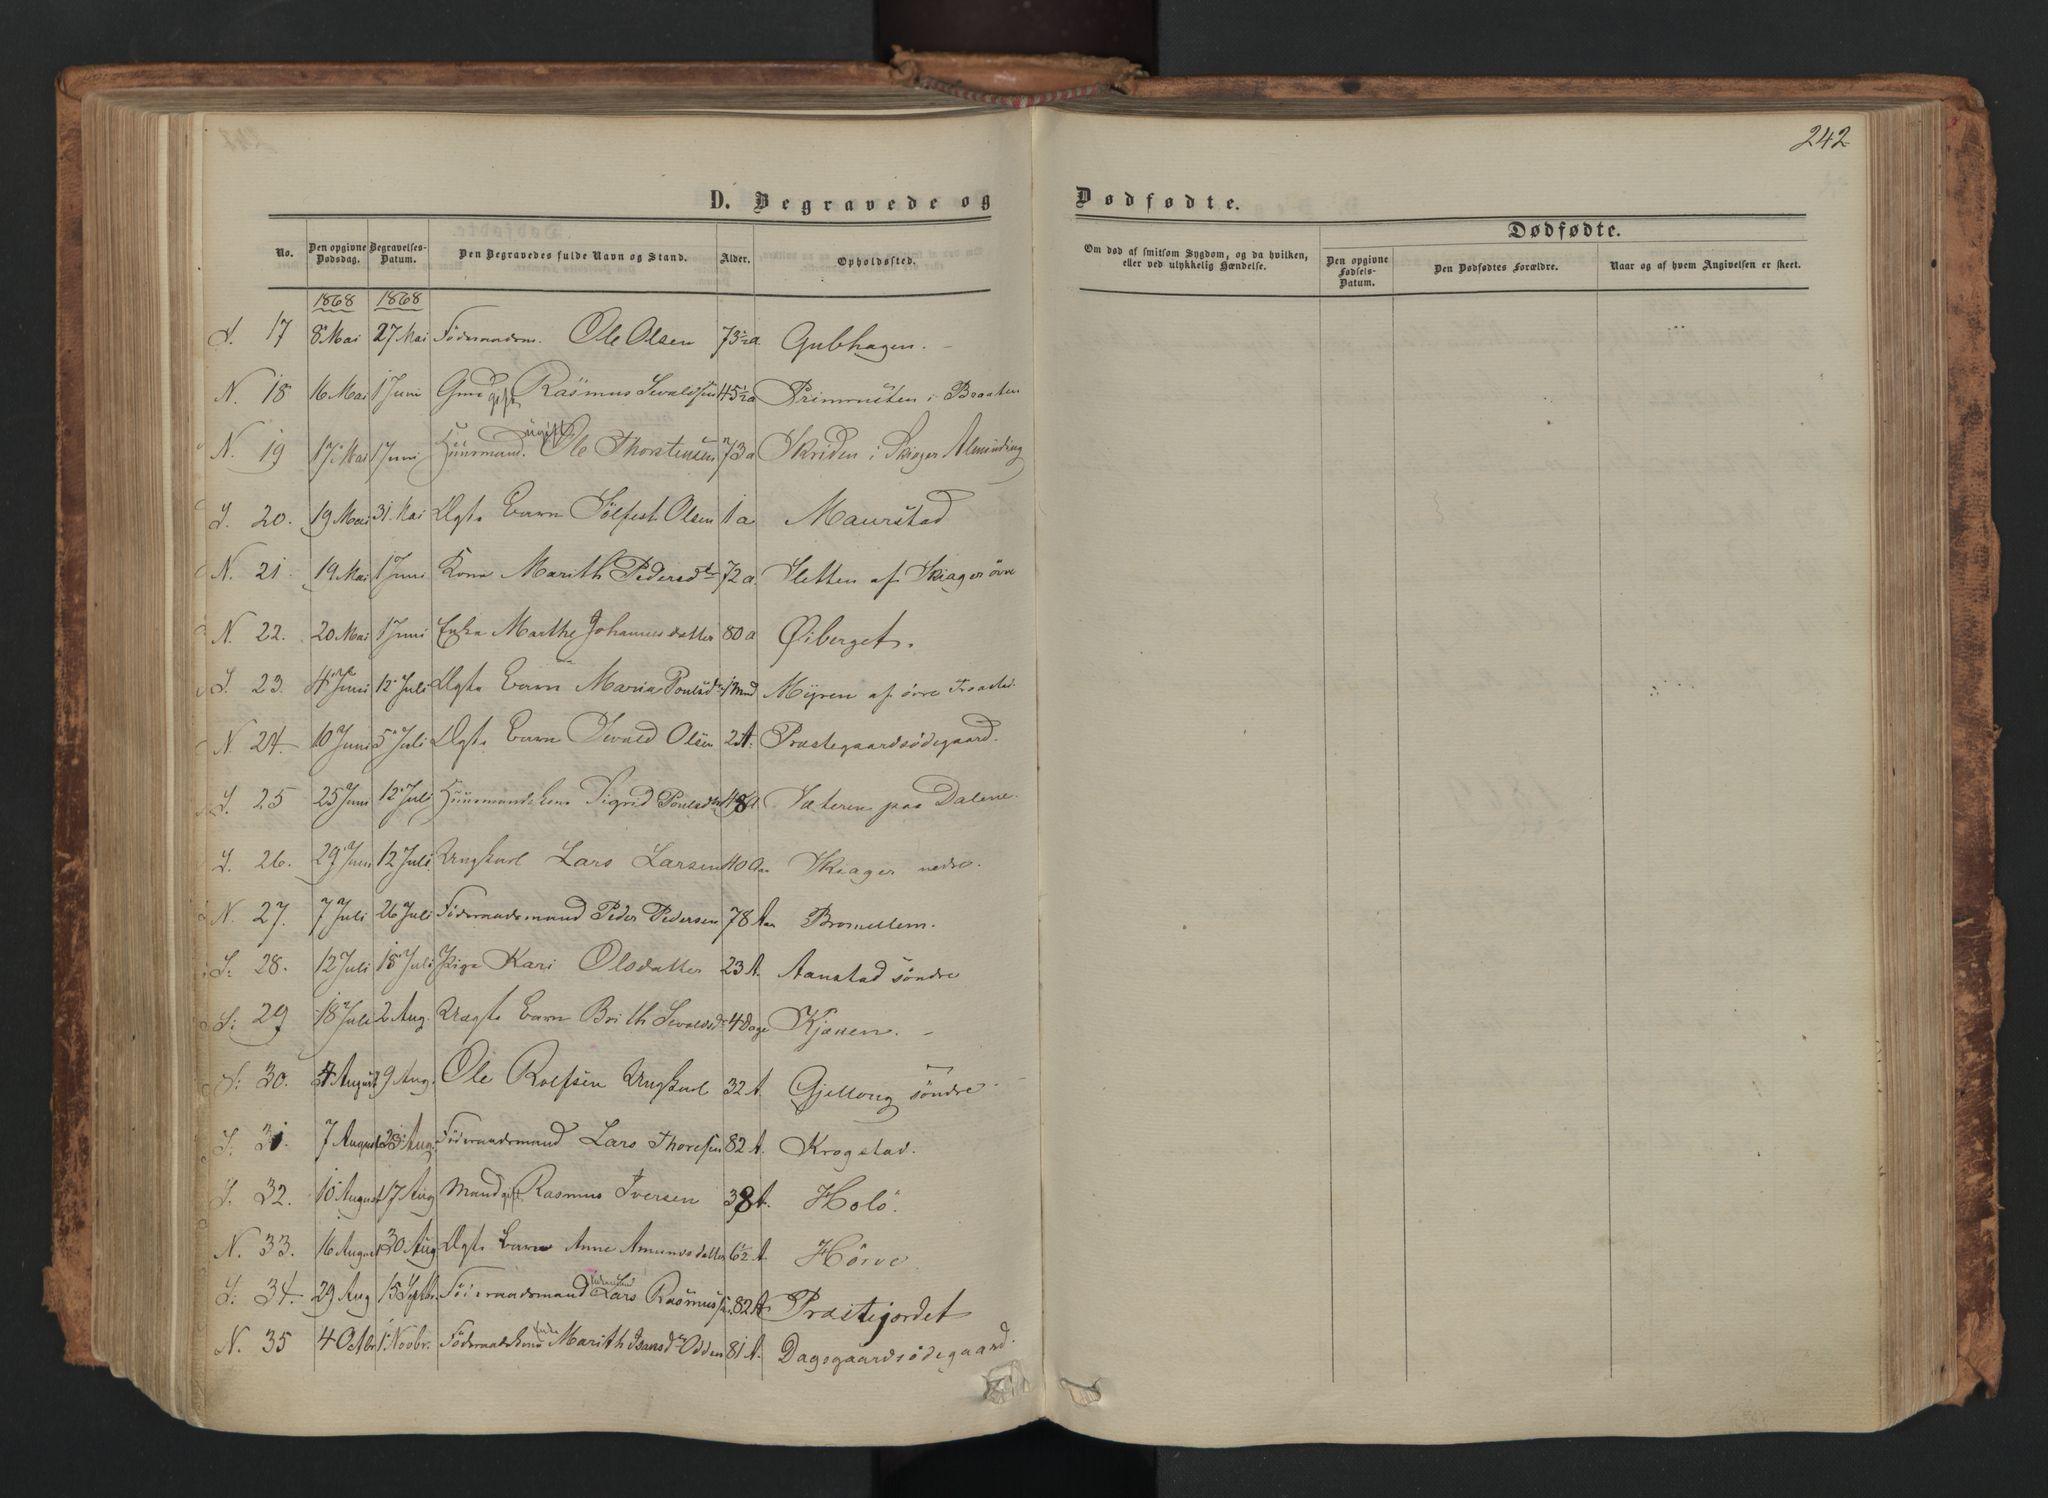 SAH, Skjåk prestekontor, Ministerialbok nr. 1, 1863-1879, s. 242